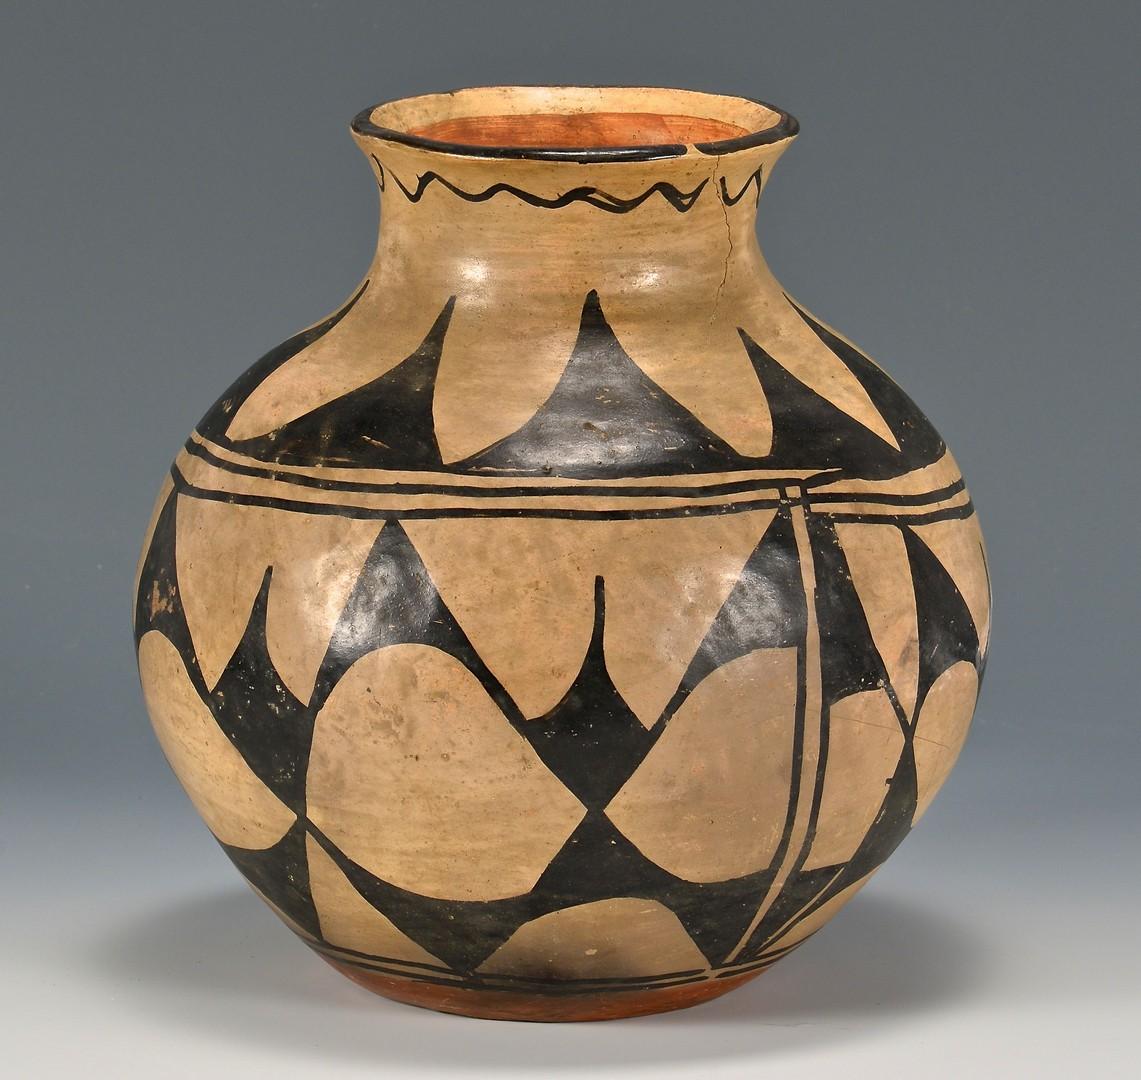 Lot 524 Southwest Native American Pottery Olla